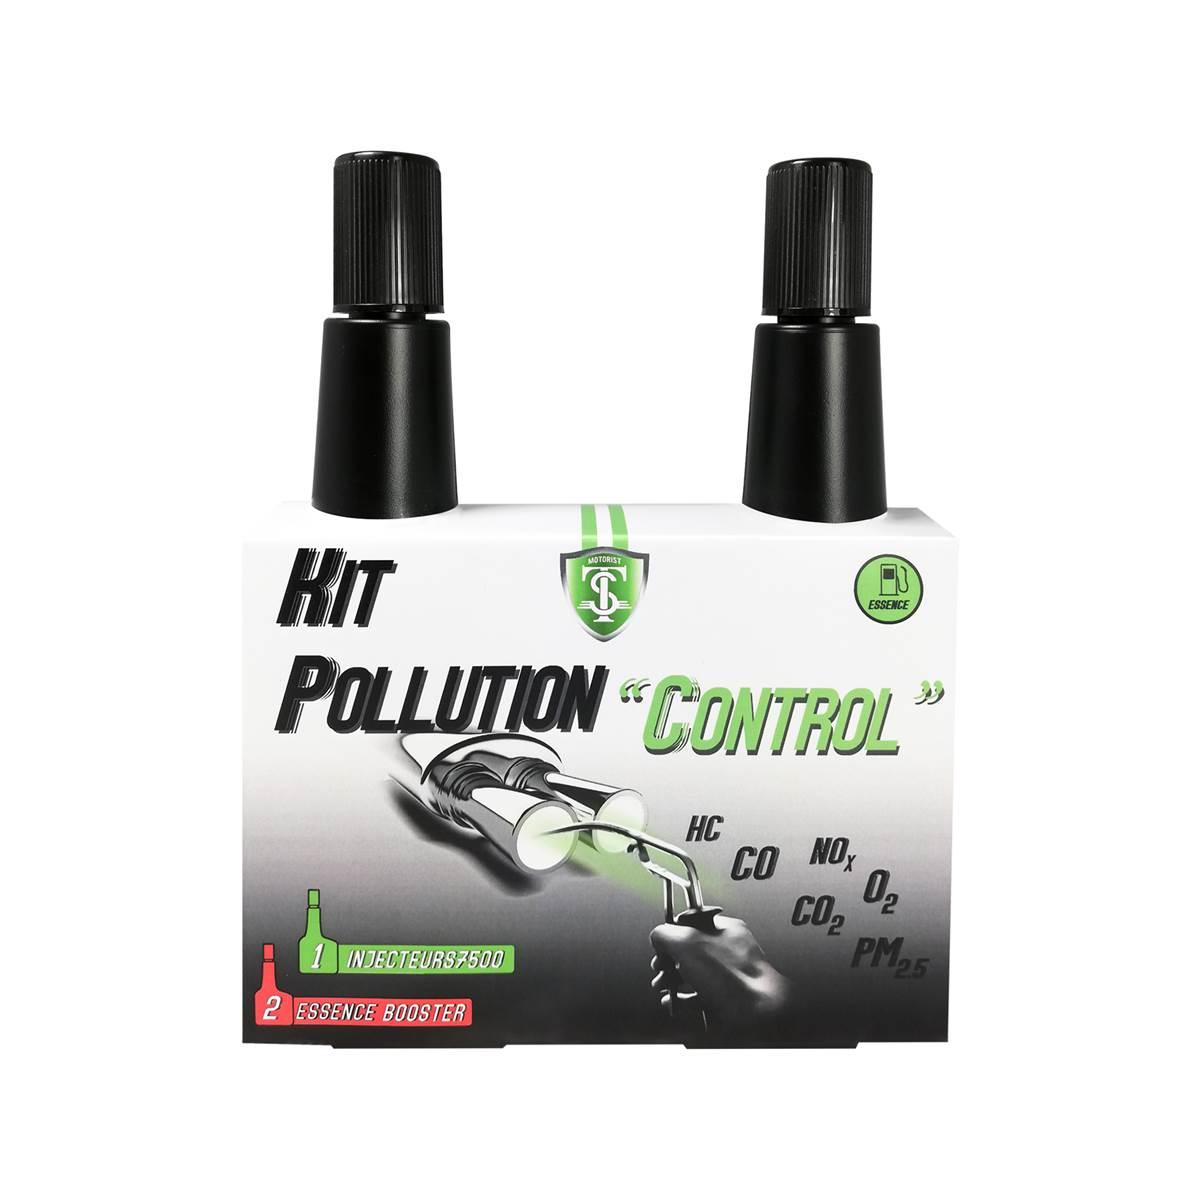 Kit Pollution Control Essence Spheretech 700 ml